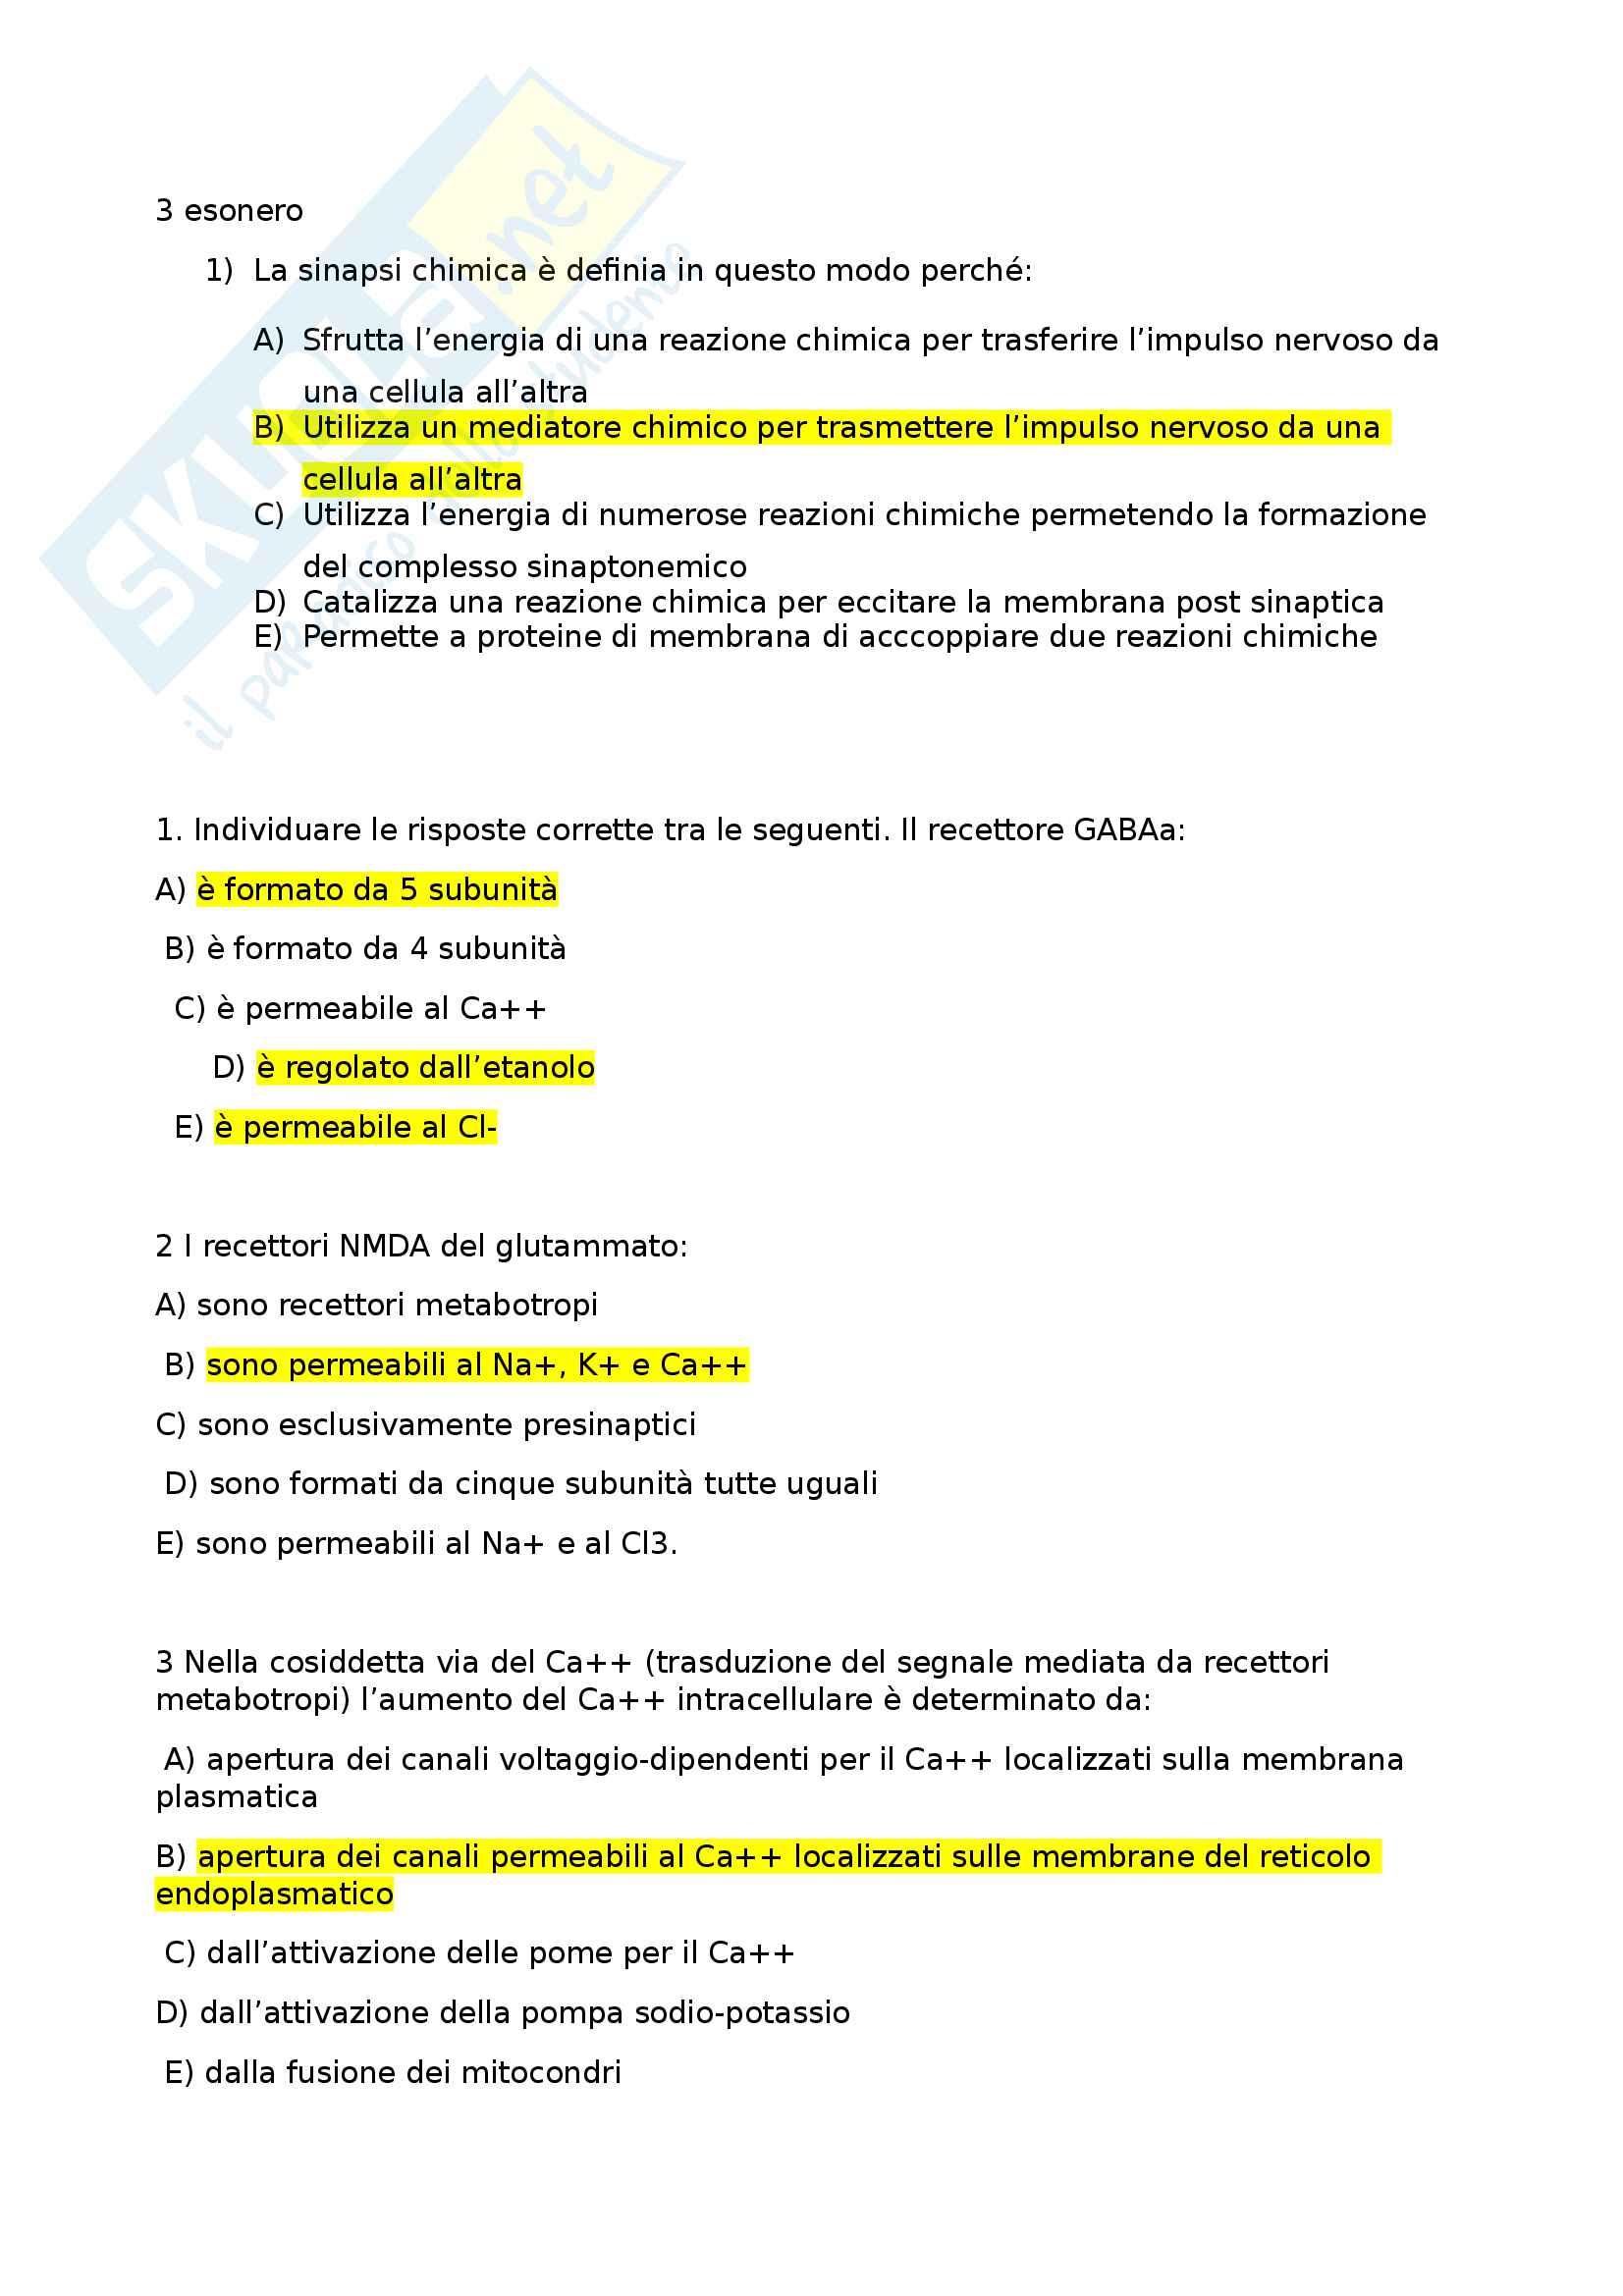 Domande esame biologia, prof Bevilacqua